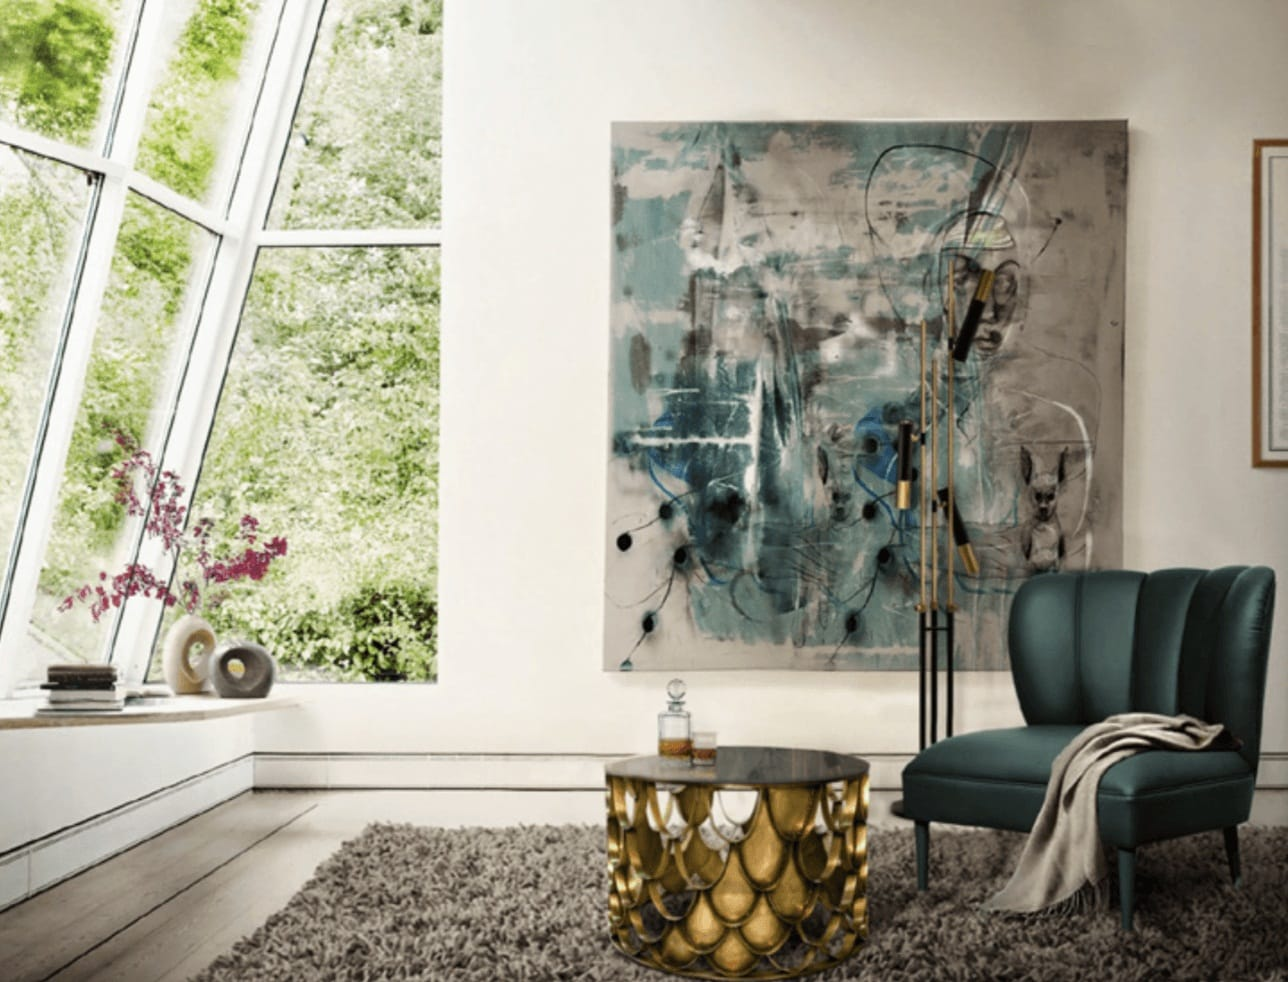 Interior-Design-Healthy-Colorful-Innovative-Karla-Design